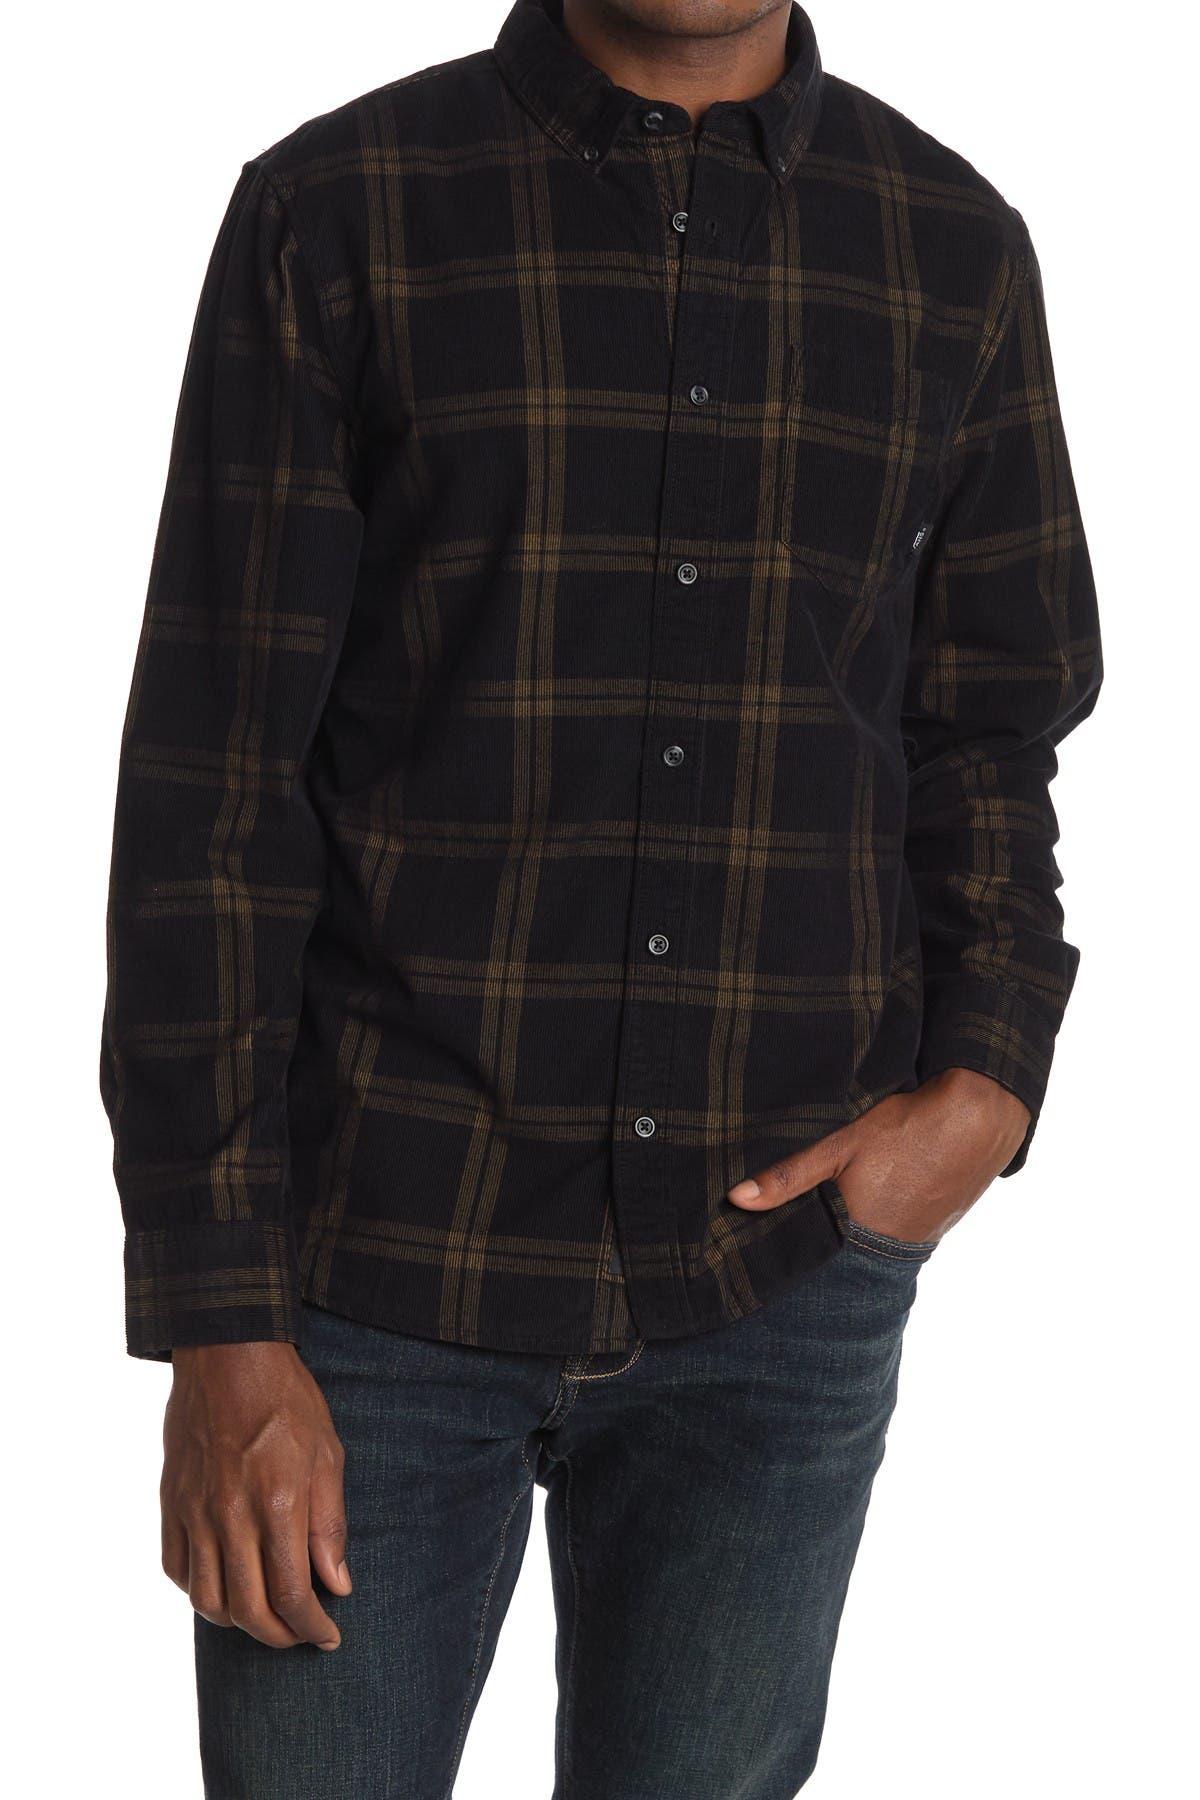 Image of VANS Sherwood Plaid Shirt